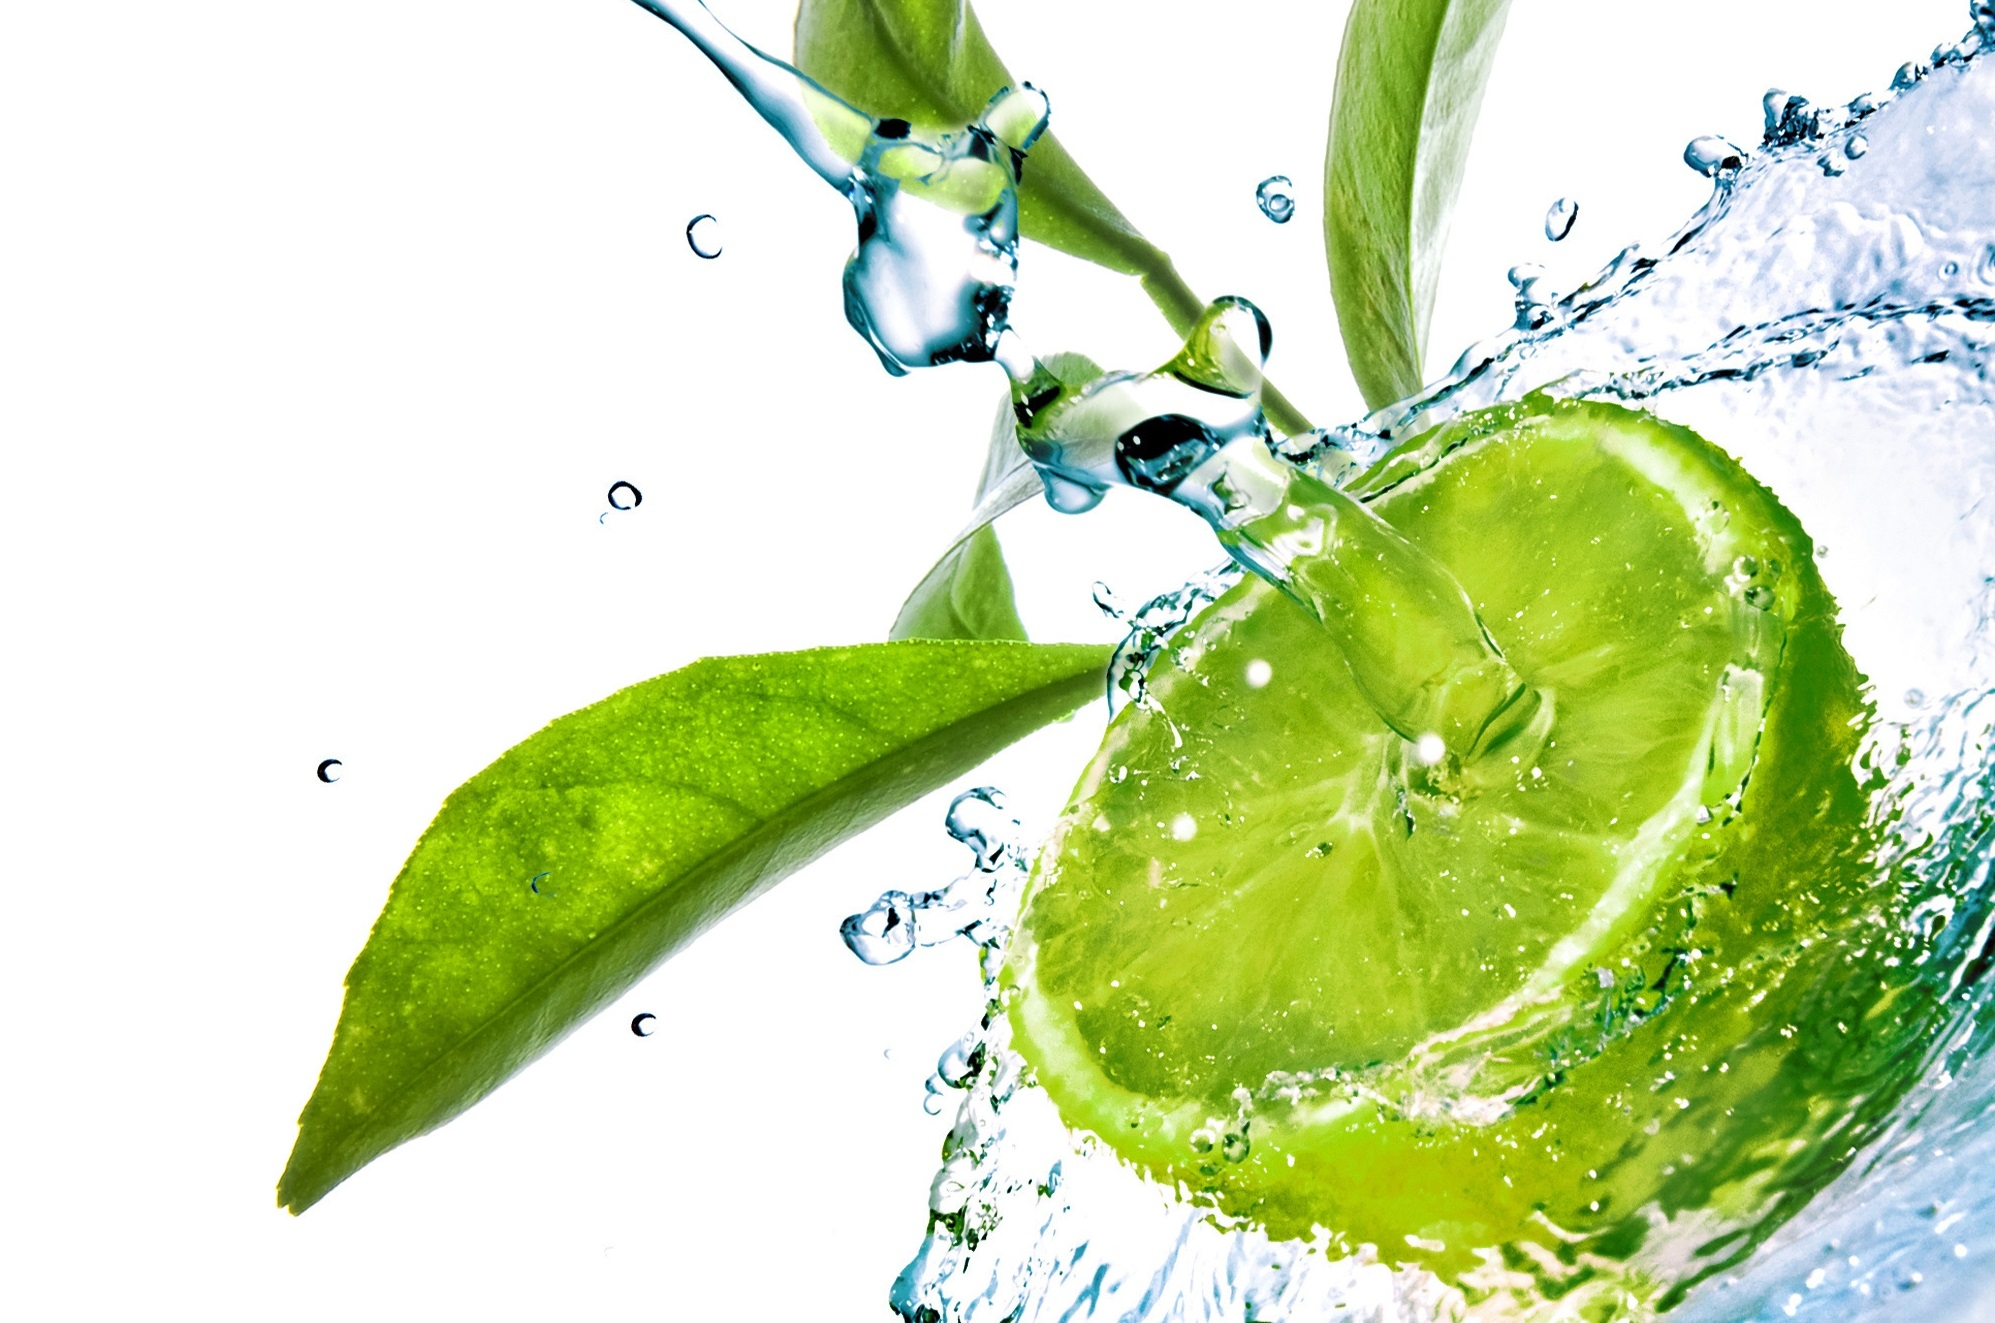 Lime For Desktop